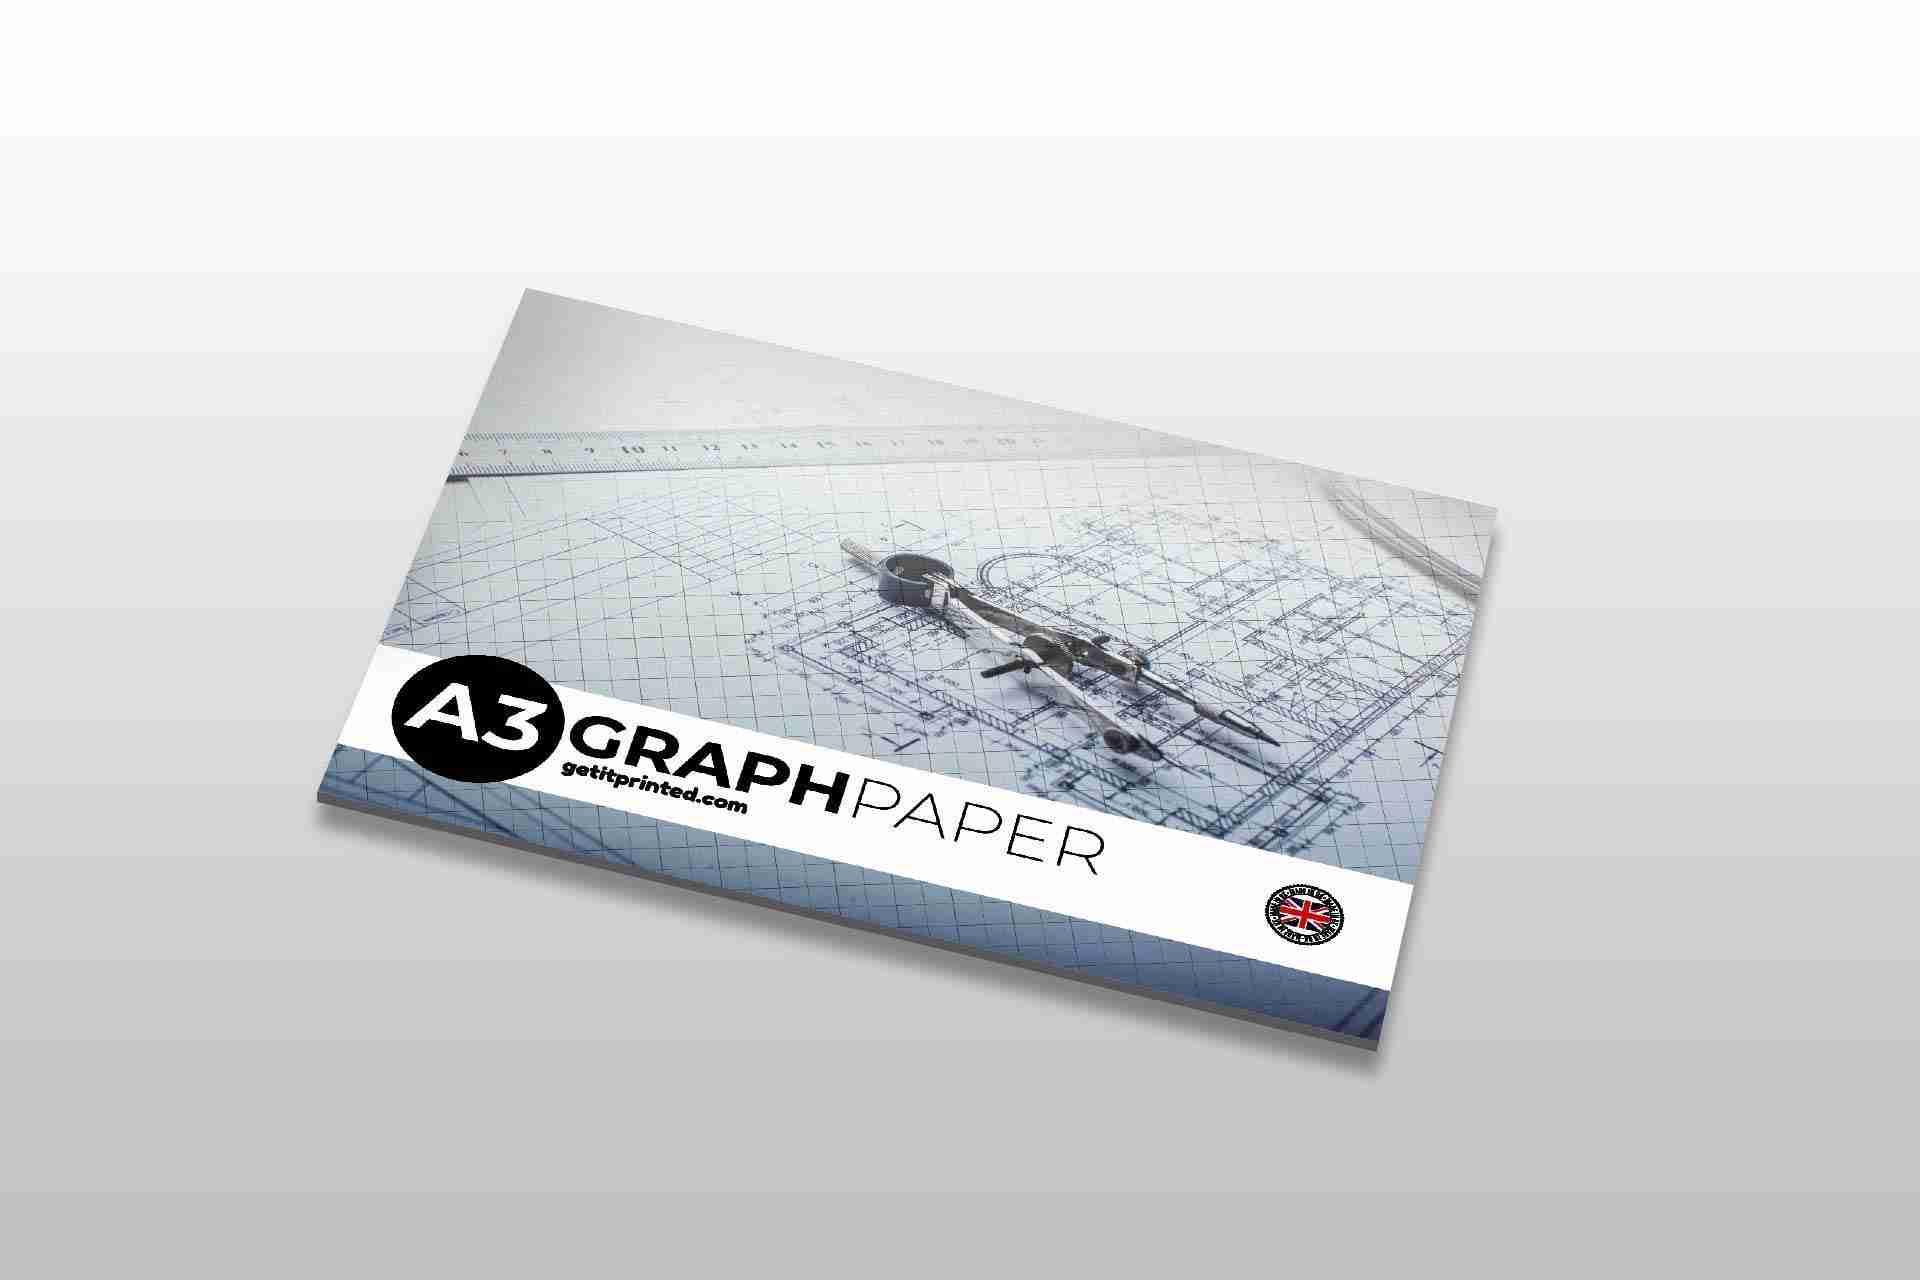 A3-Graph-Pad